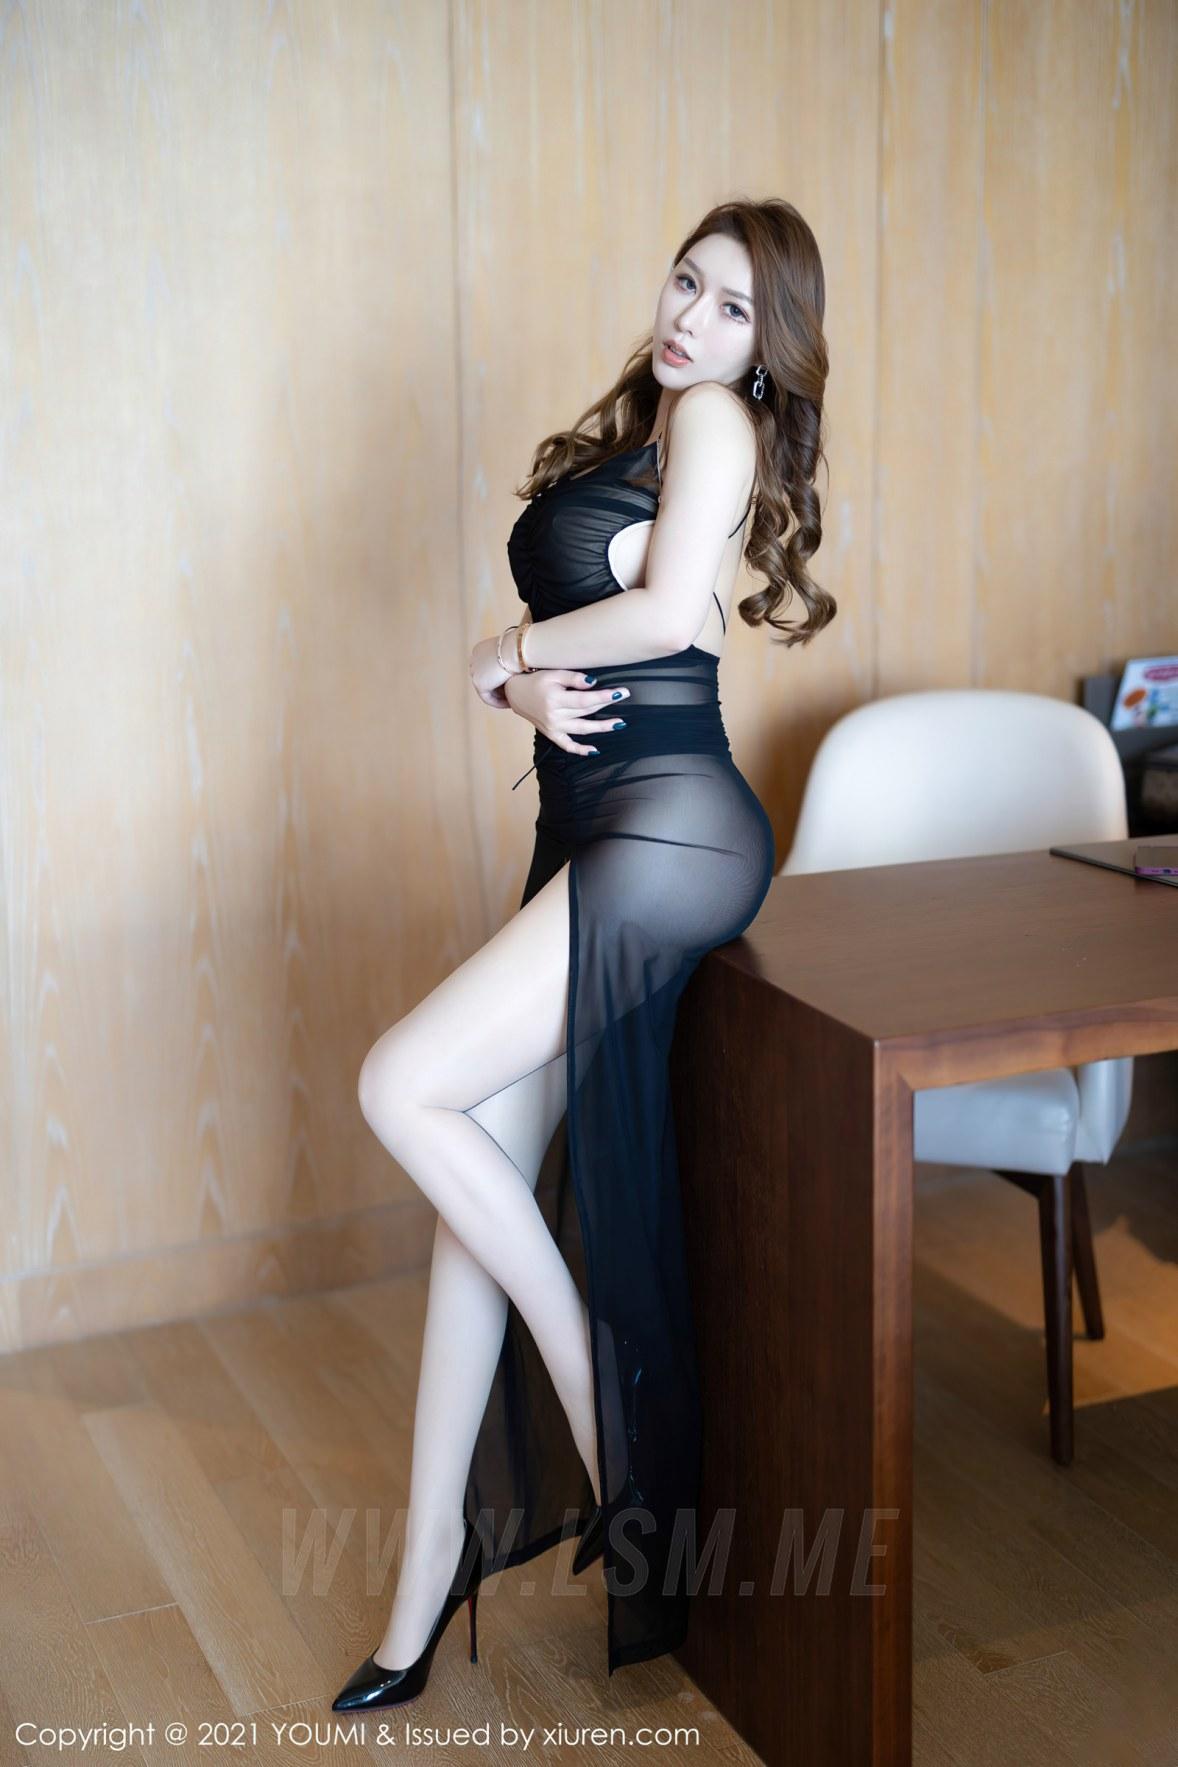 YOUMI 尤蜜荟 Vol.583 熟女翘臀 尤妮丝 薄透魅惑 - 3